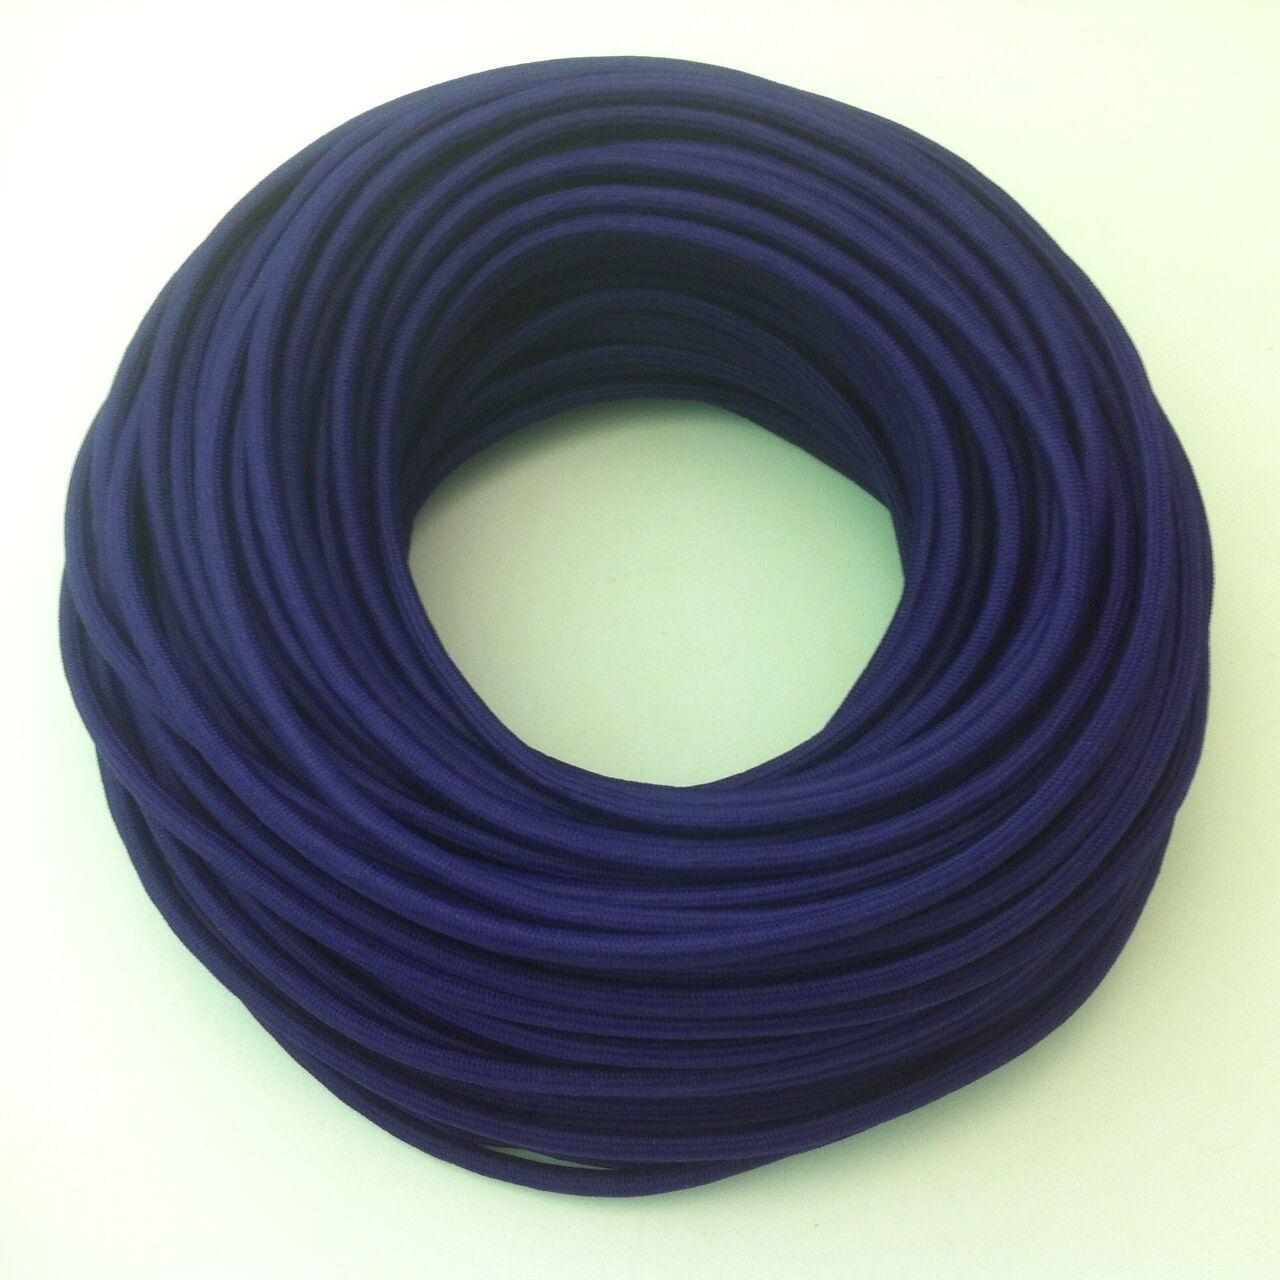 Textilkabel Stoffkabel 100m Design Zug-Pendelleitung Lila 2x0,75 TOP EU Qualität